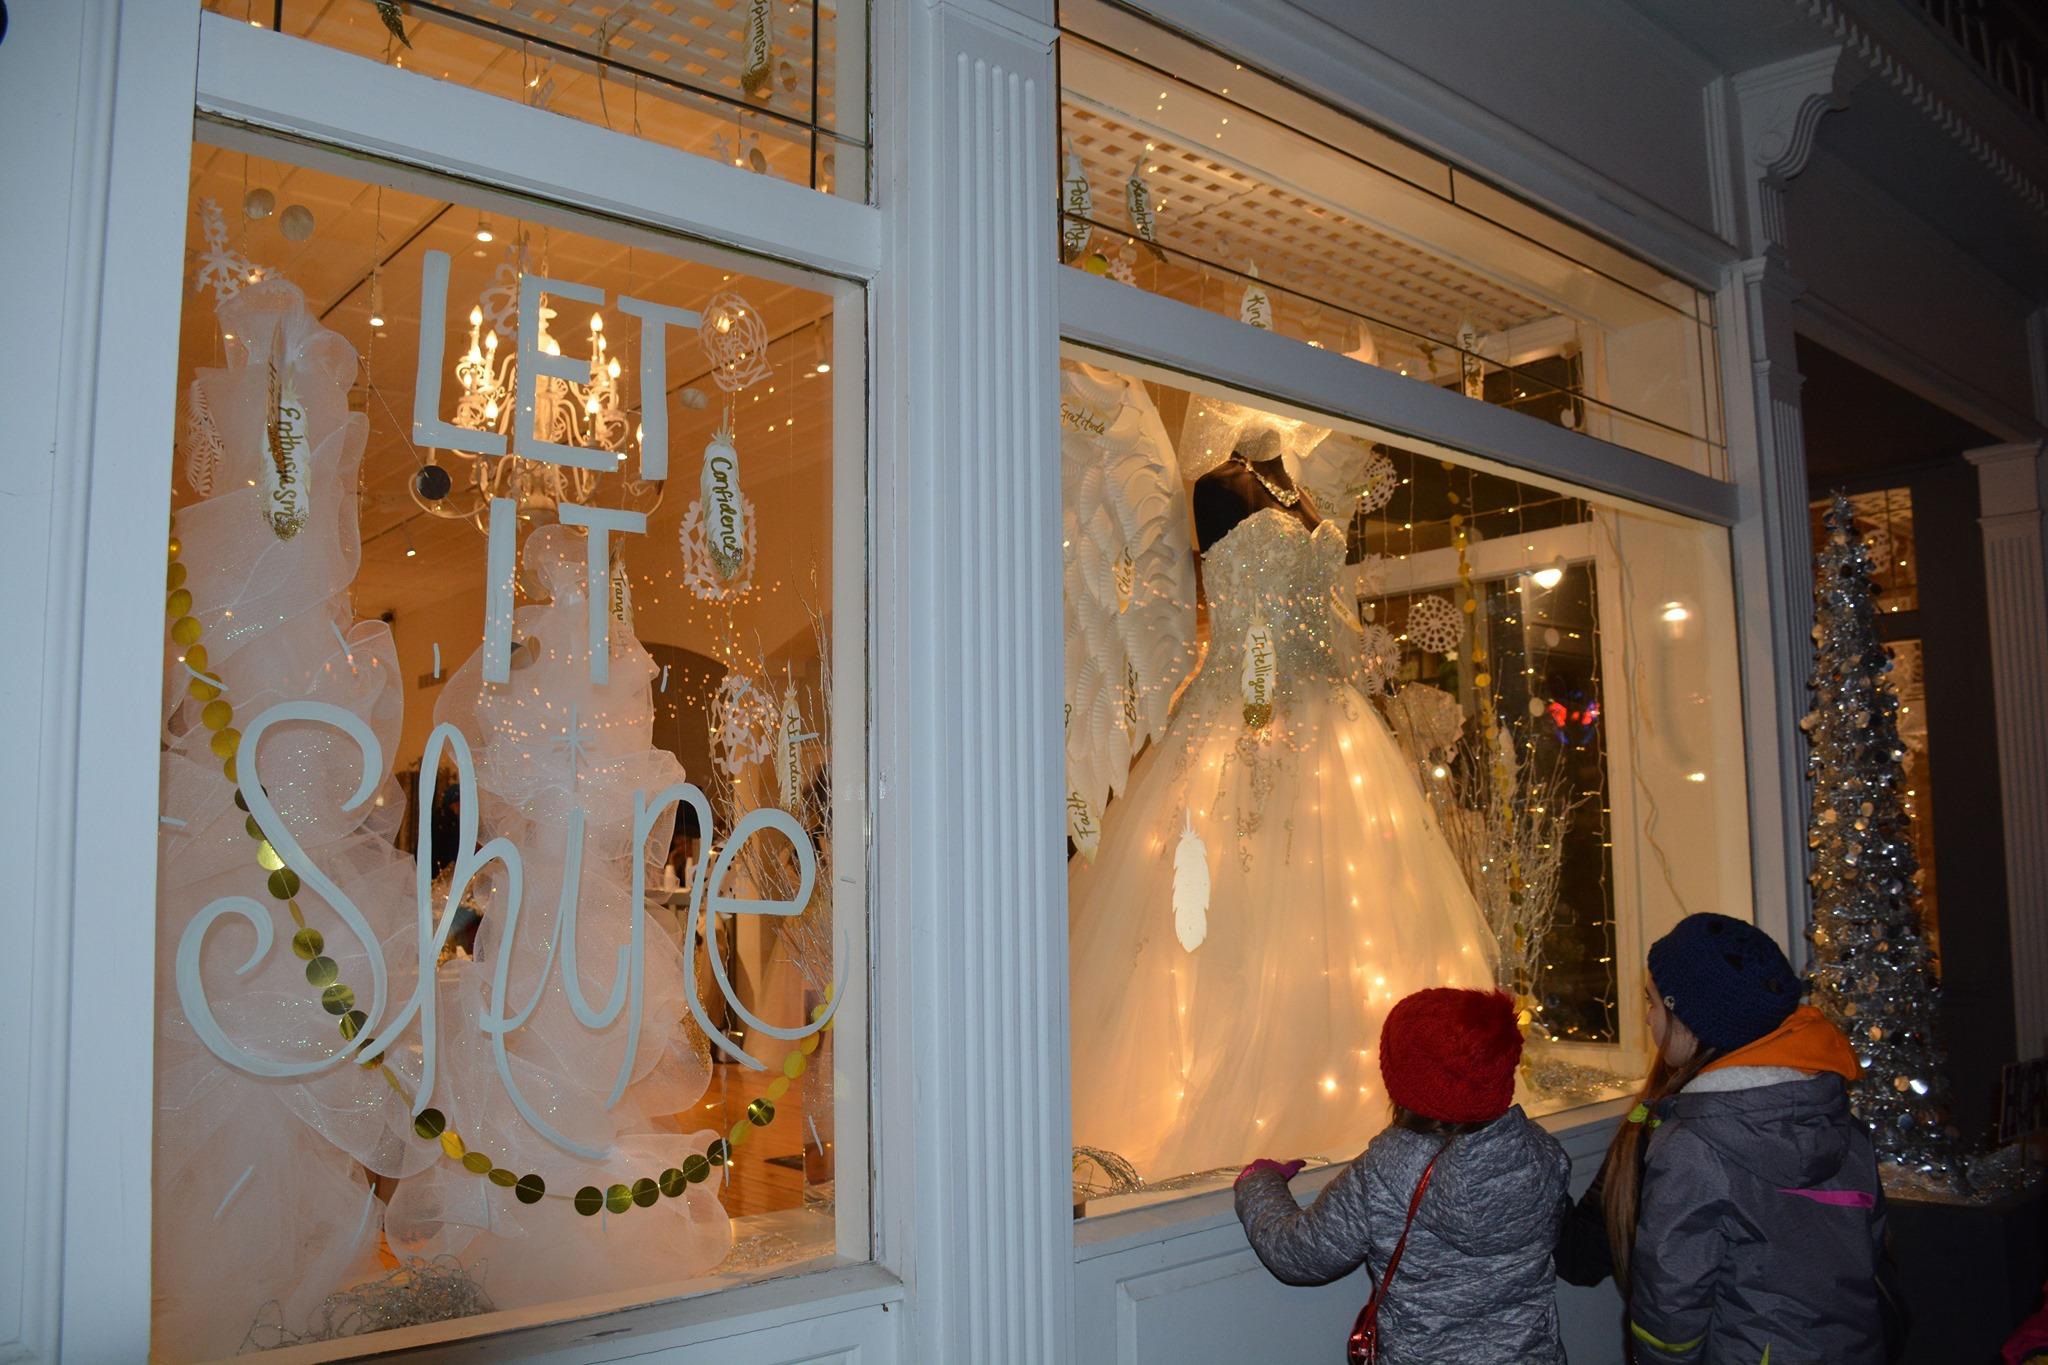 Downtown Milford Celebrates its 150th Holiday Season!